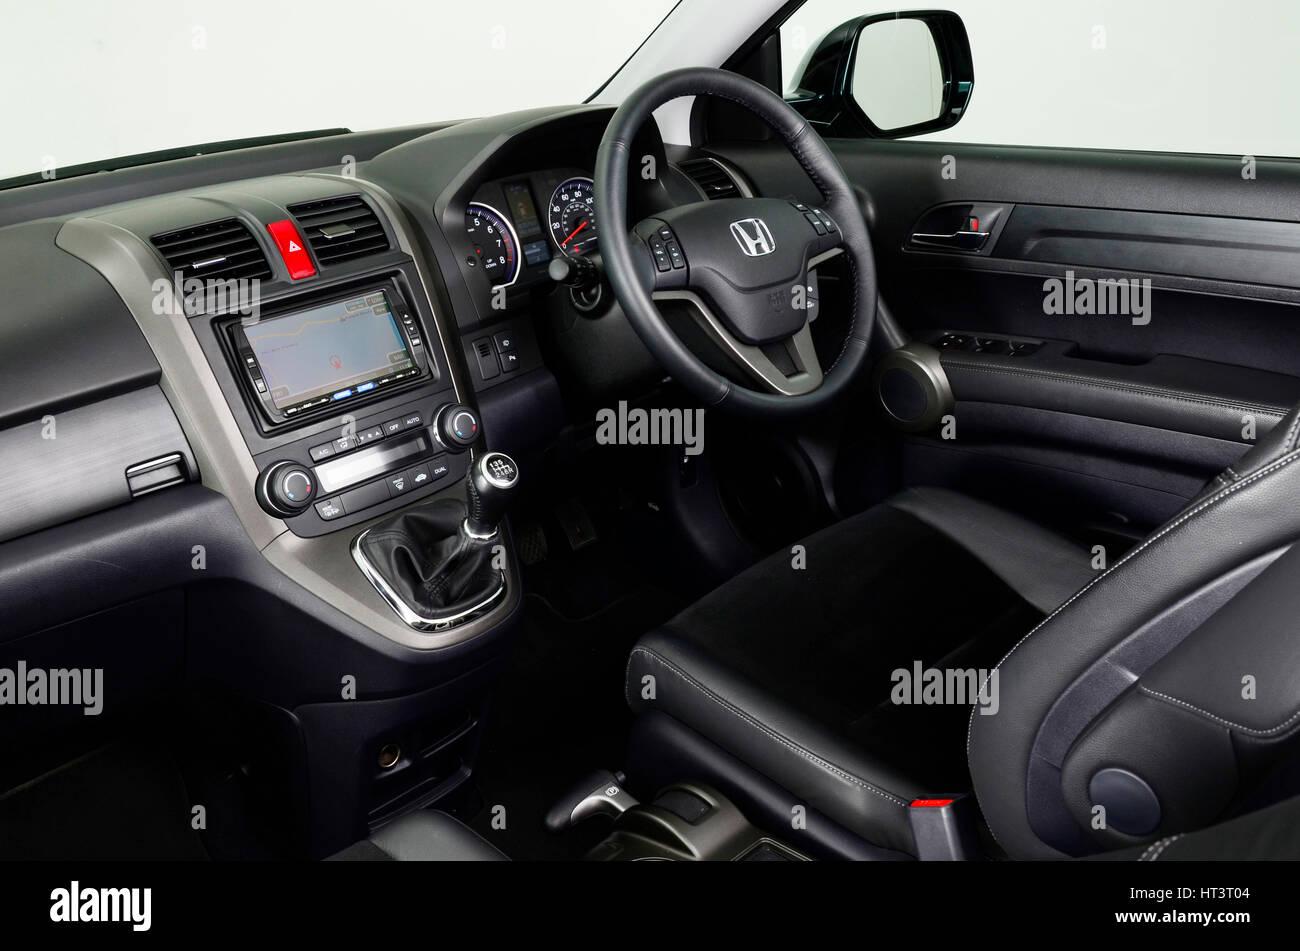 2010 Honda CRV Artist: Unknown. - Stock Image